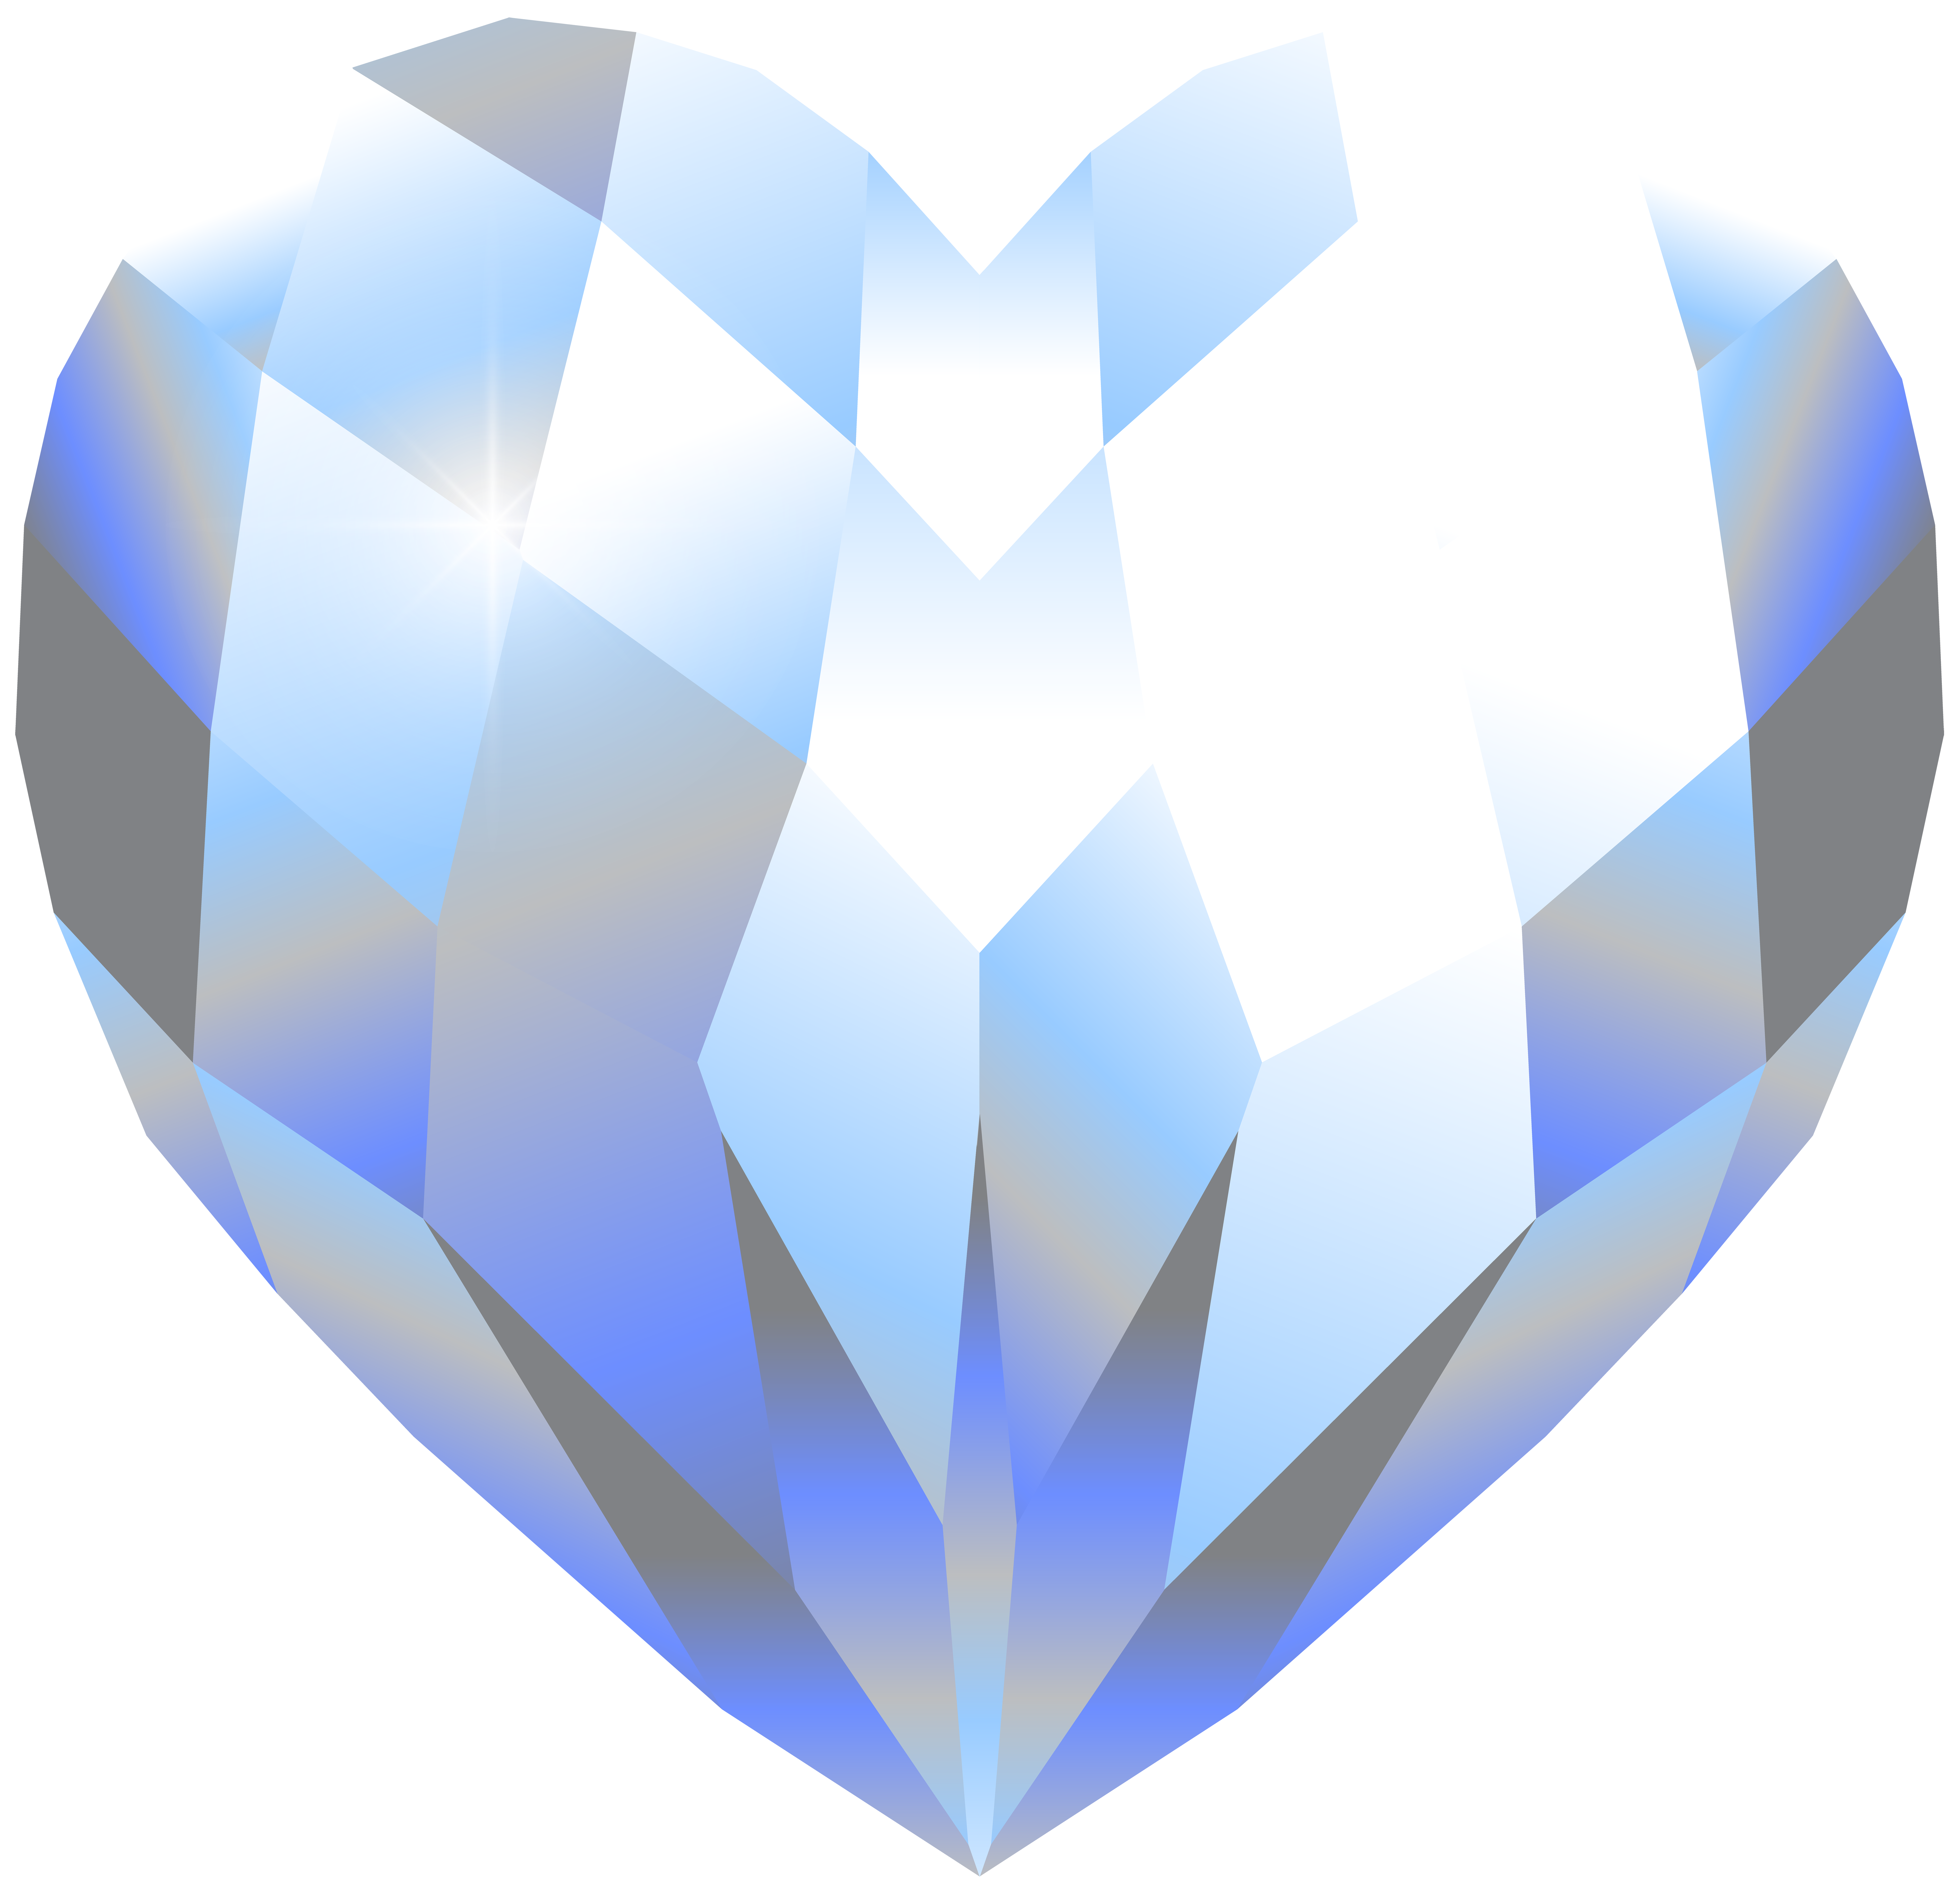 Crystal clip art png. Galaxy clipart heart